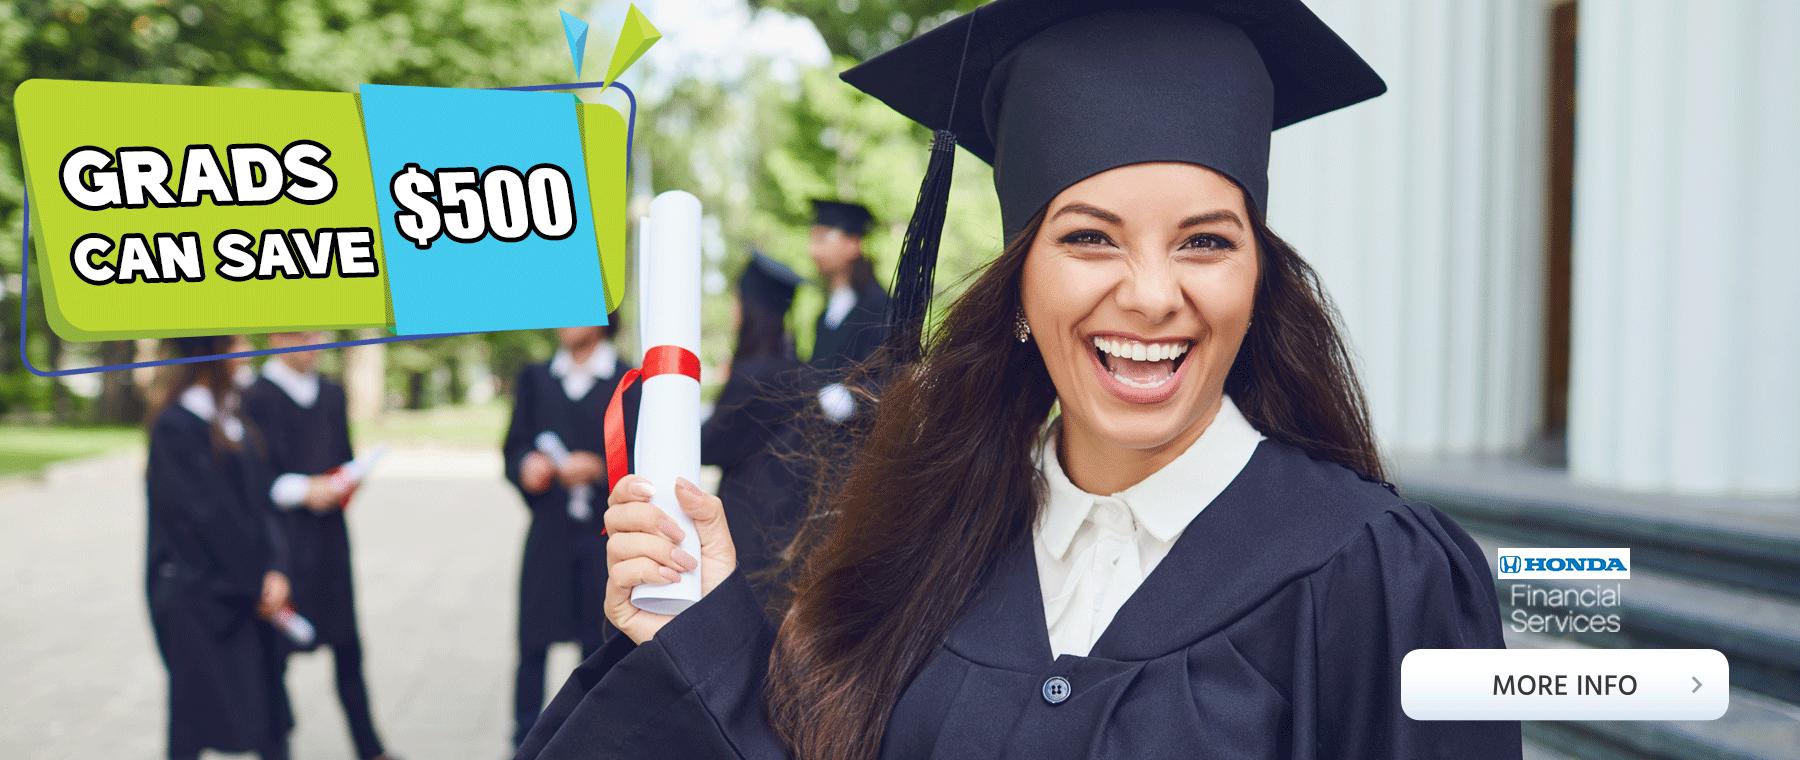 Honda College Grad Program save 500